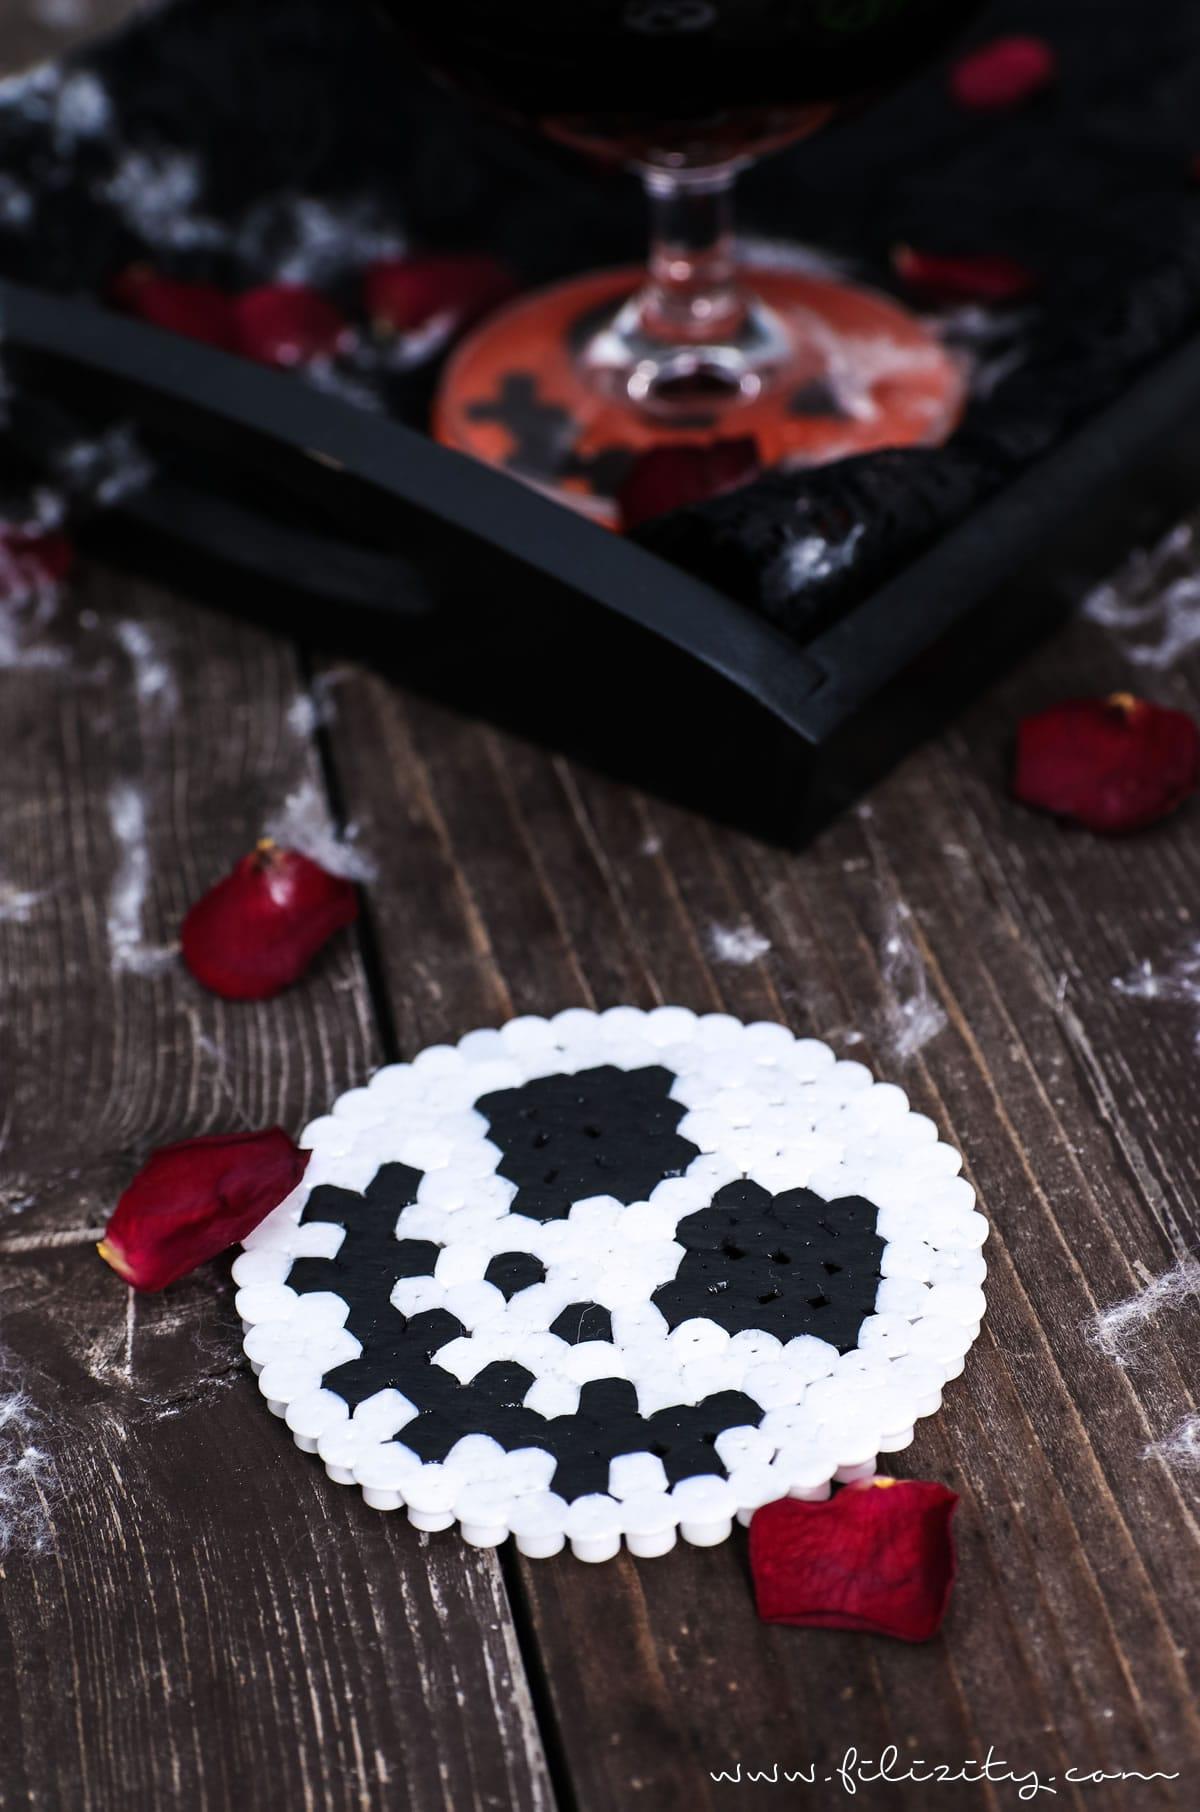 DIY Halloween Deko: Bügelperlen-Glasuntersetzer Jack Skellington, Frankensteins Monster & Kürbis | Filizity.com | DIY-Blog aus dem Rheinland #halloween #booh